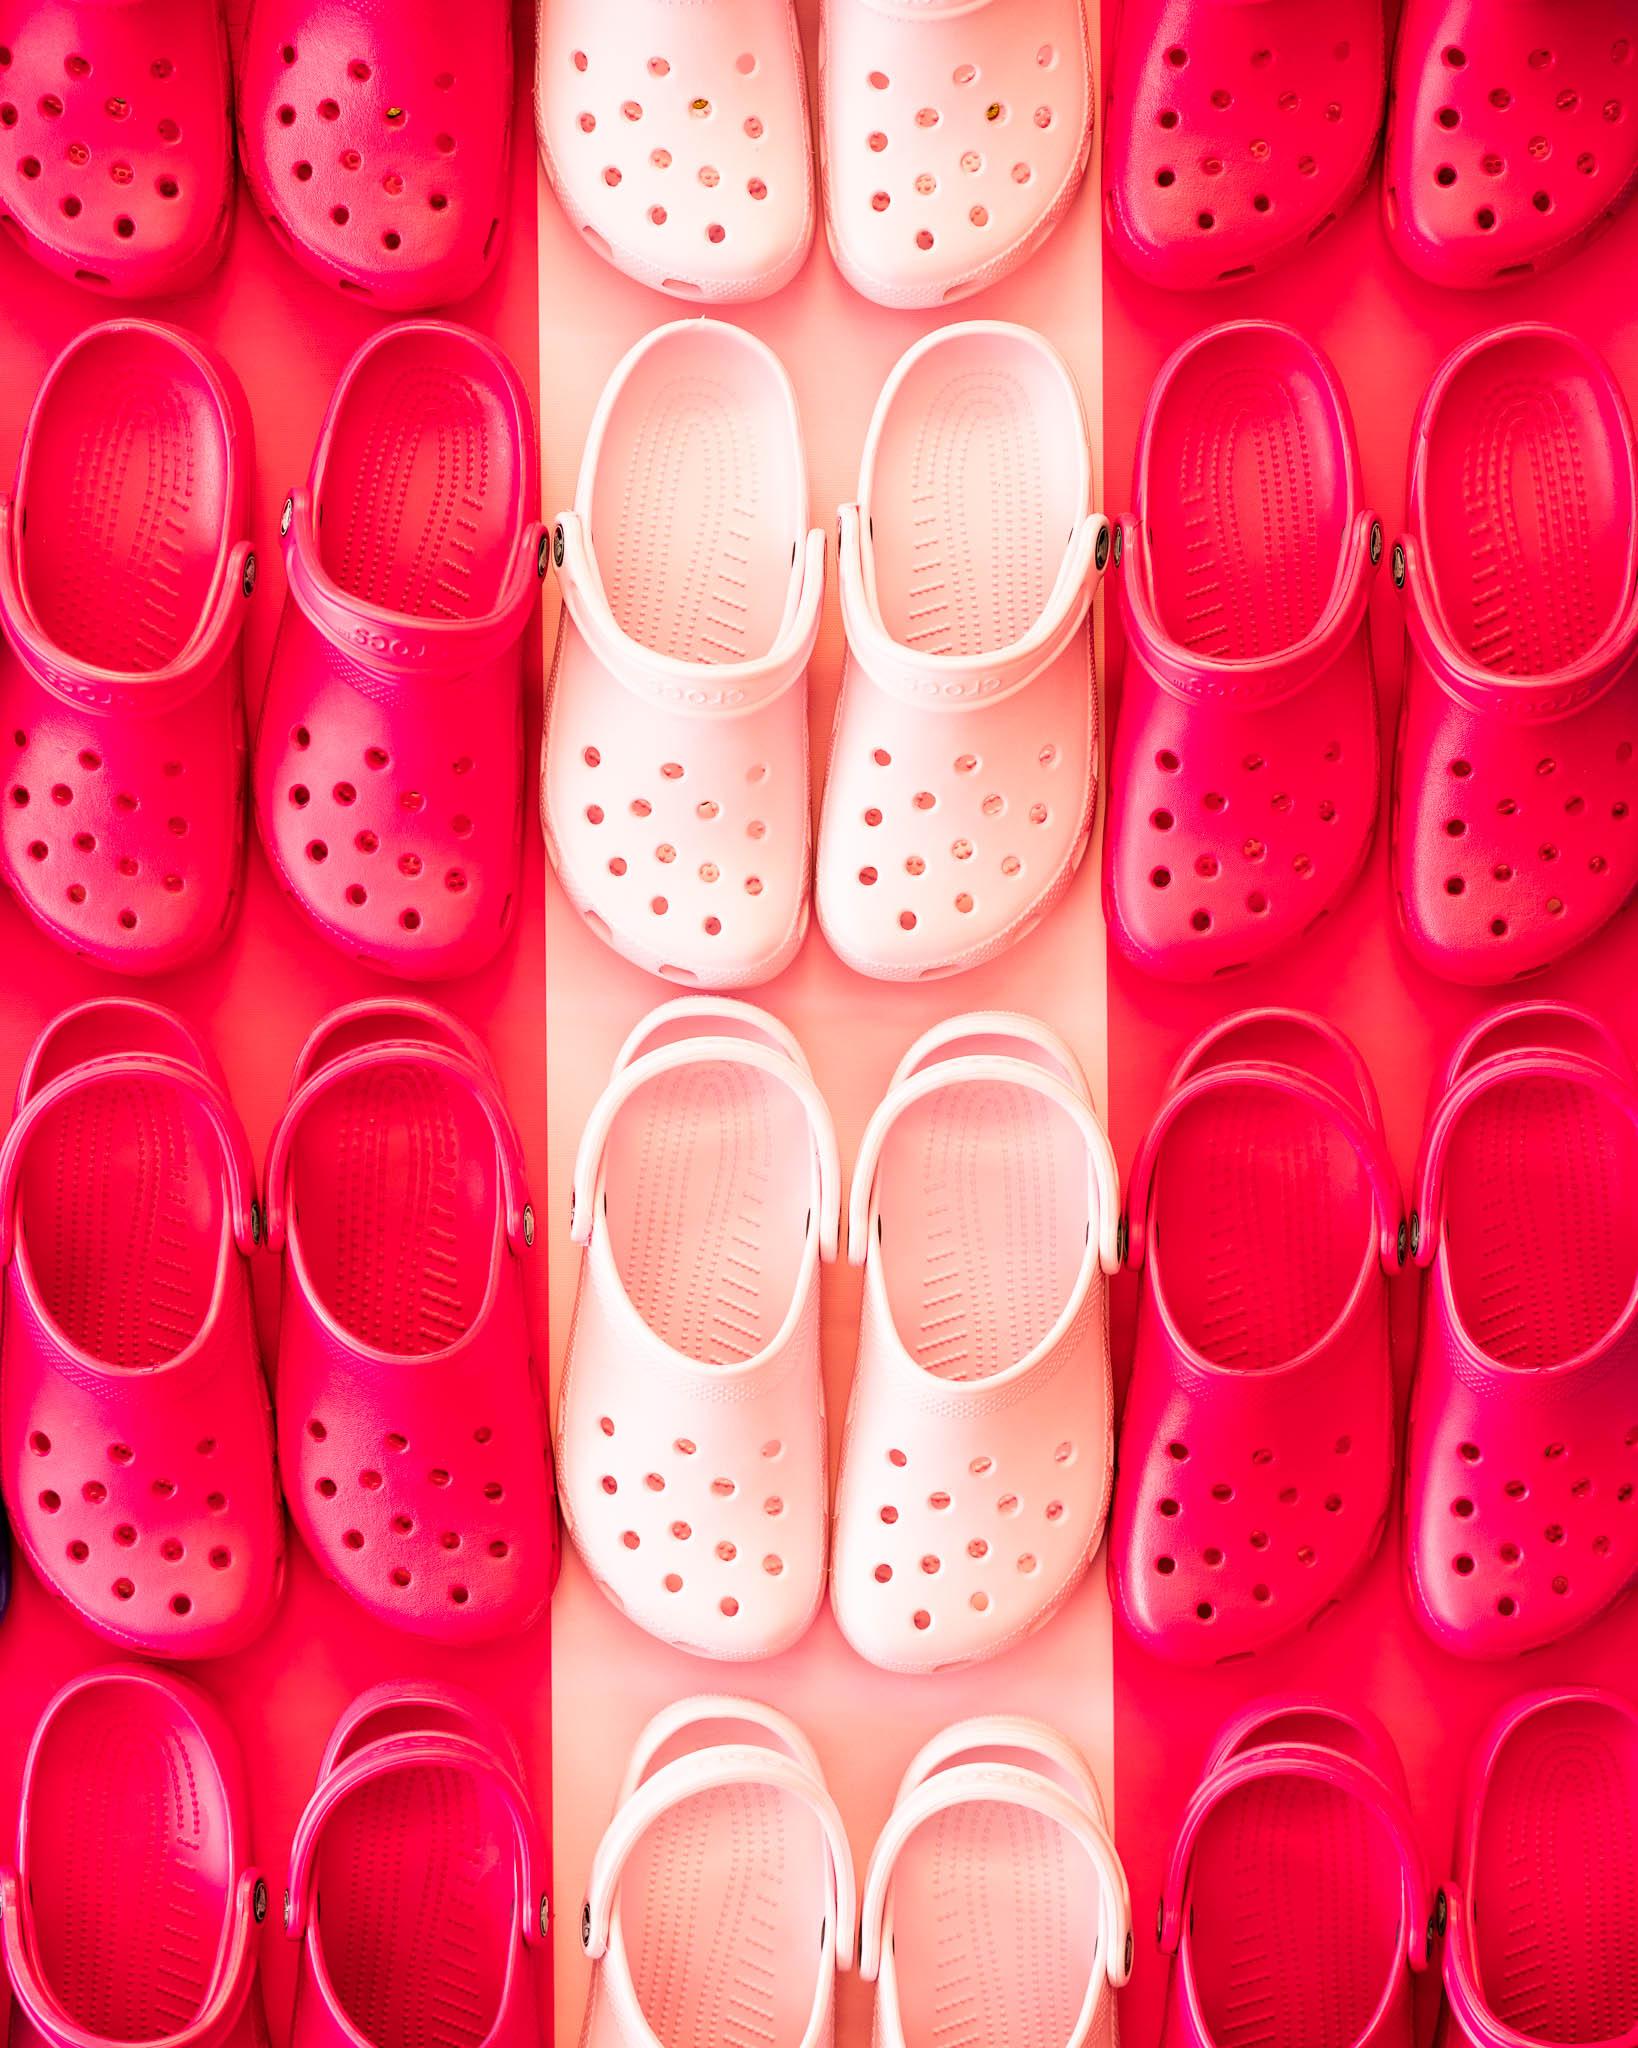 Crocs Proofs-19.jpg